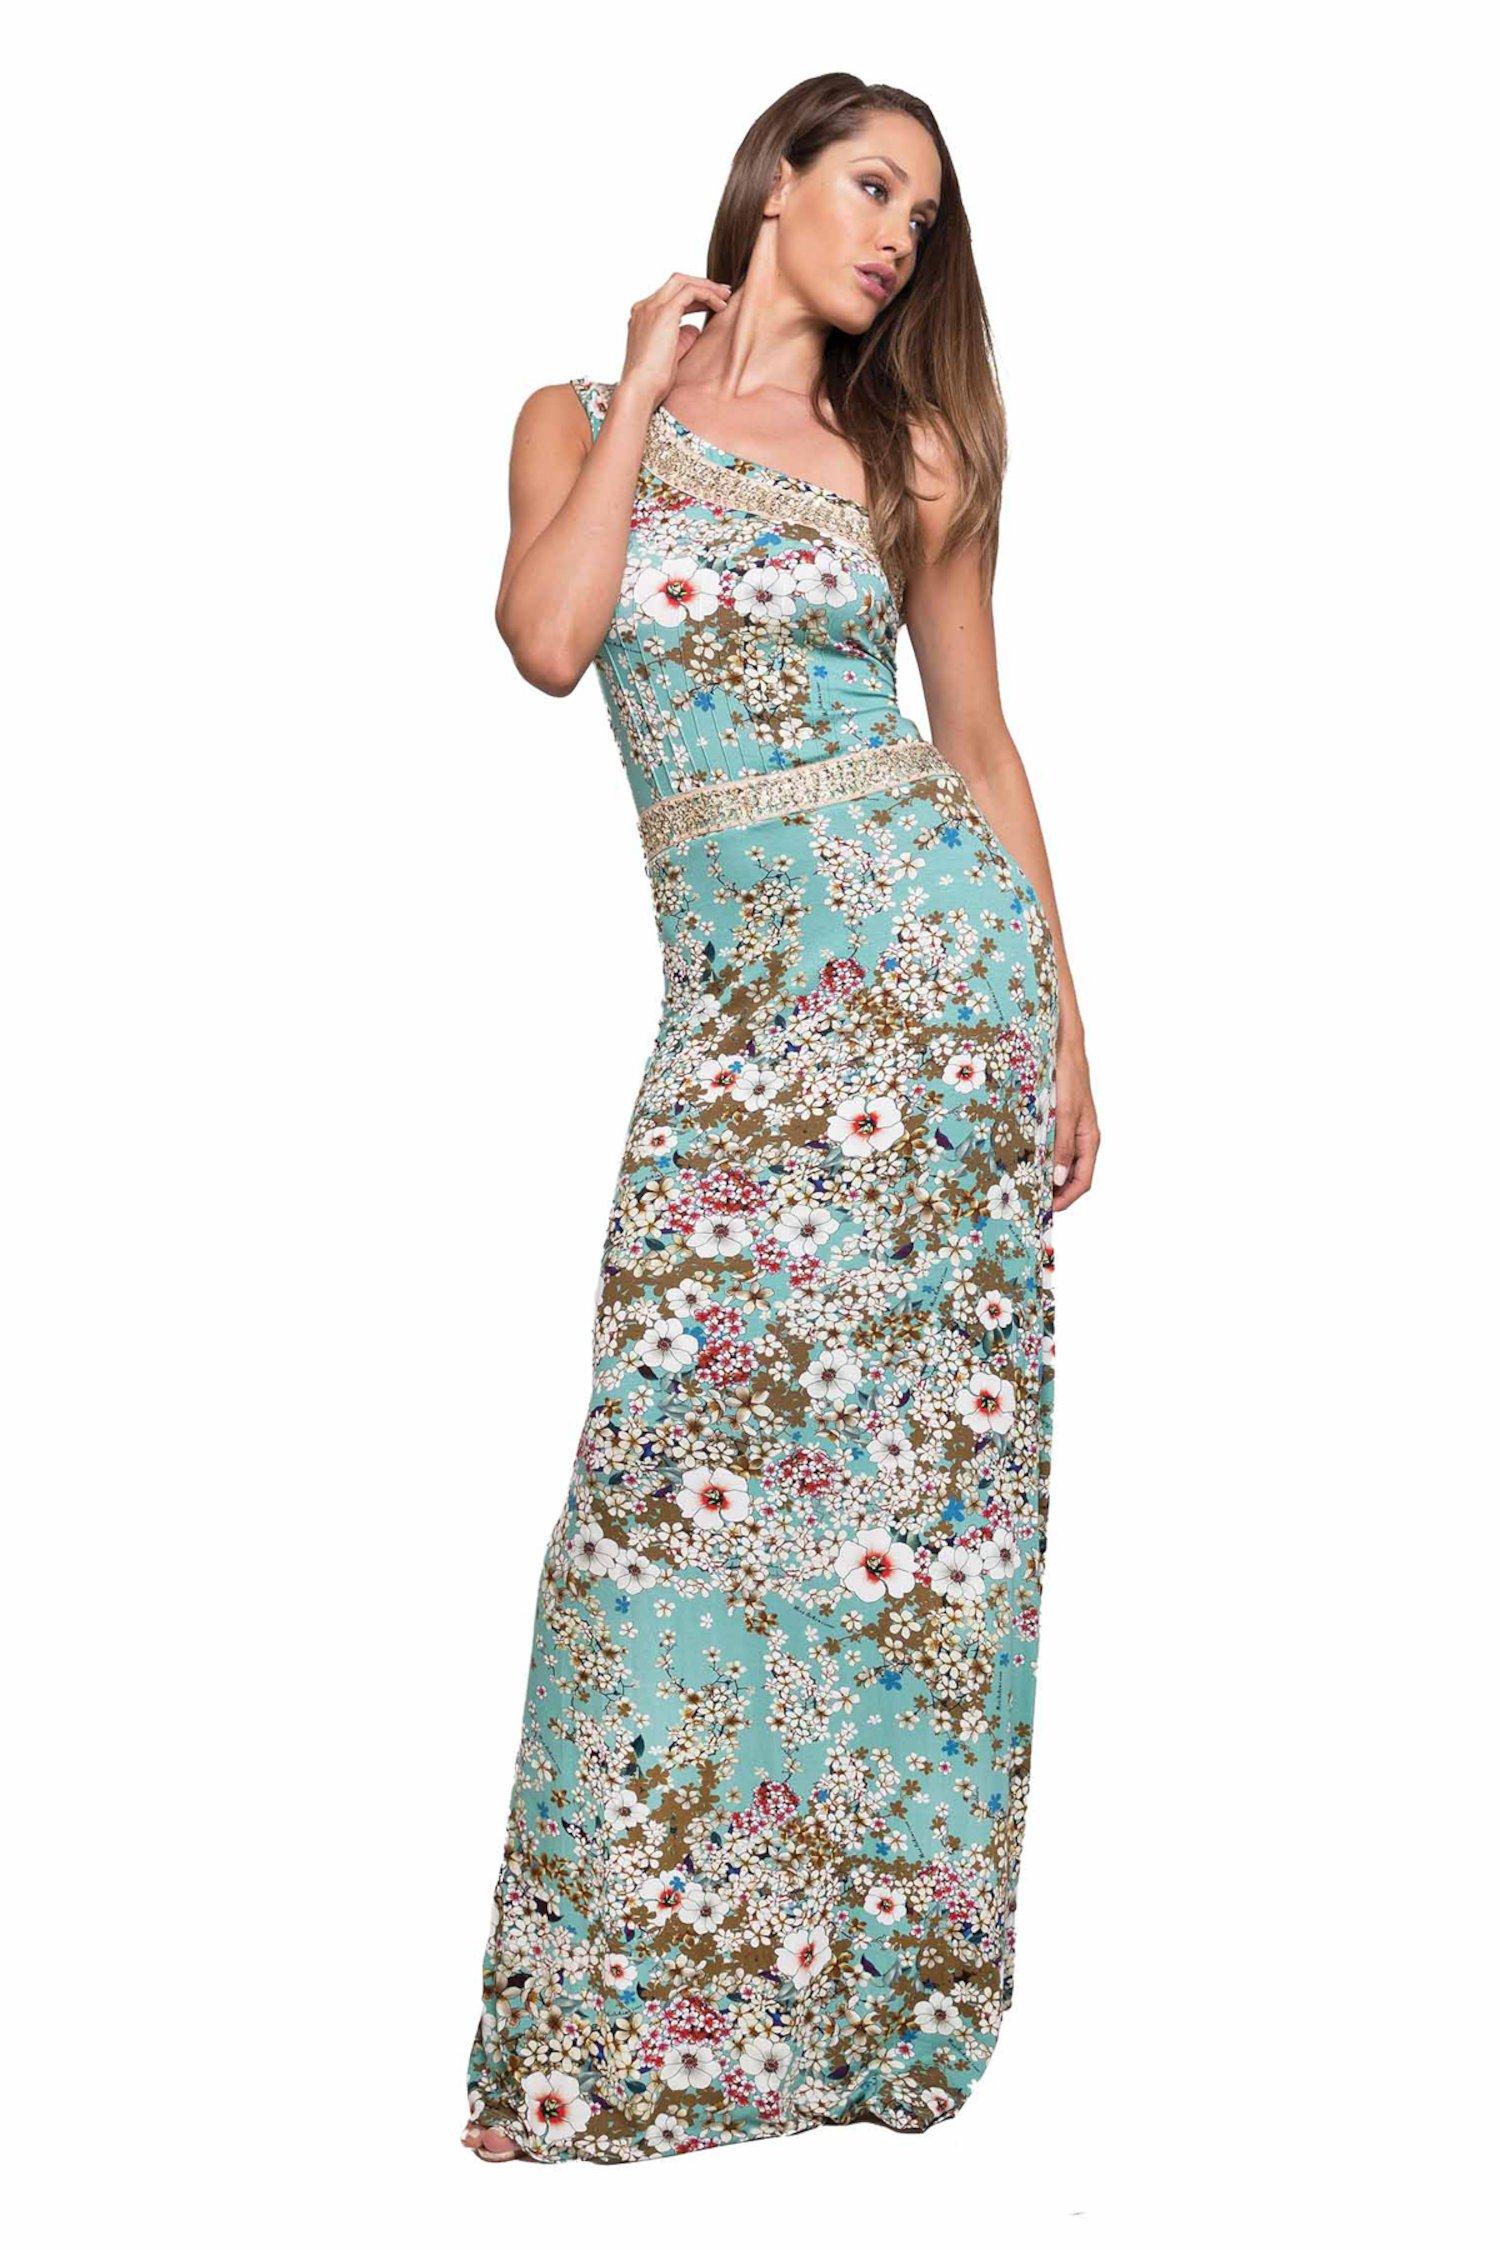 LONG DRESS ONE SHOULDER - Primavera Azzurro